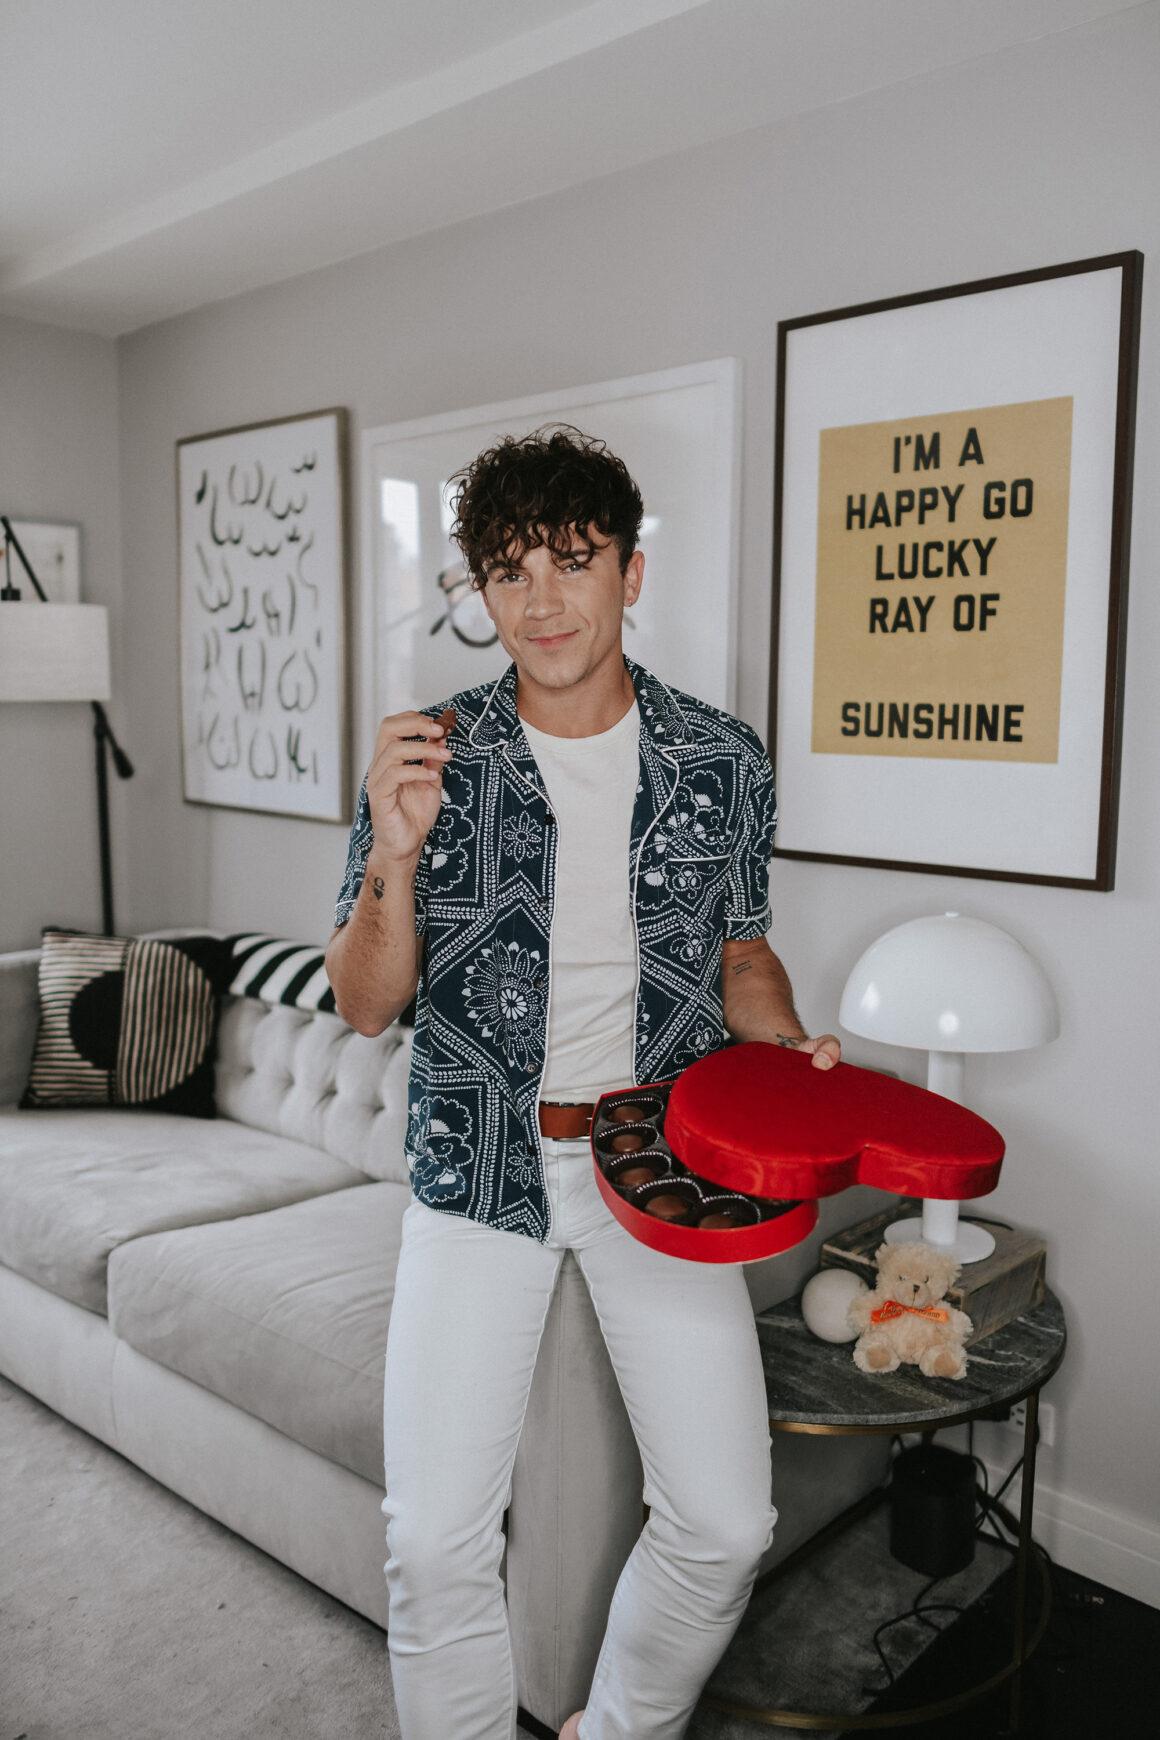 Justin Livingston Men's Levi's Bandana Shirt Valentine's Day